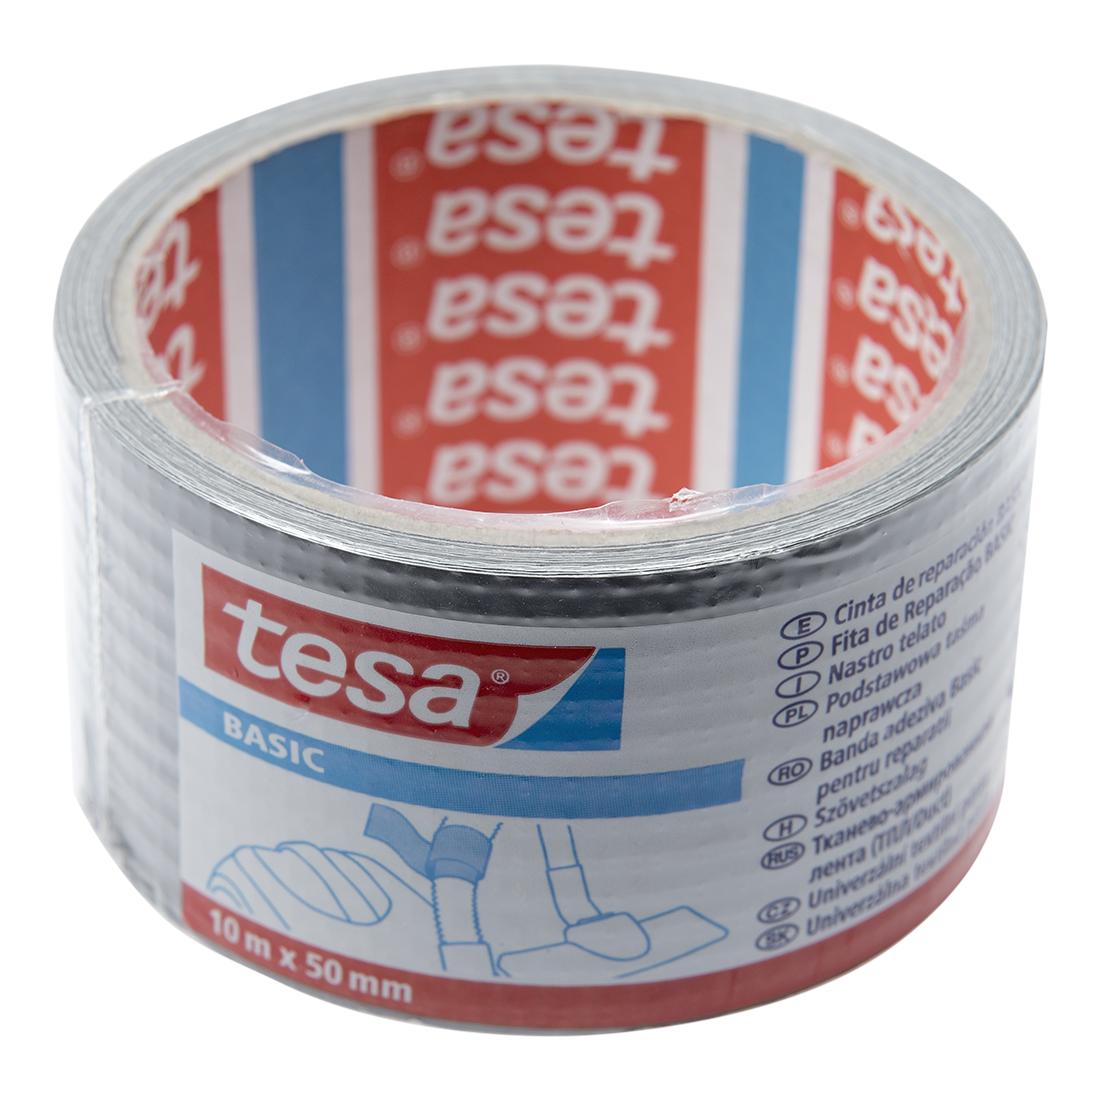 Banda adeziva pentru reparatii Tesa BASIC Duct Tape – 58586,  gri metalizat, 50 mm